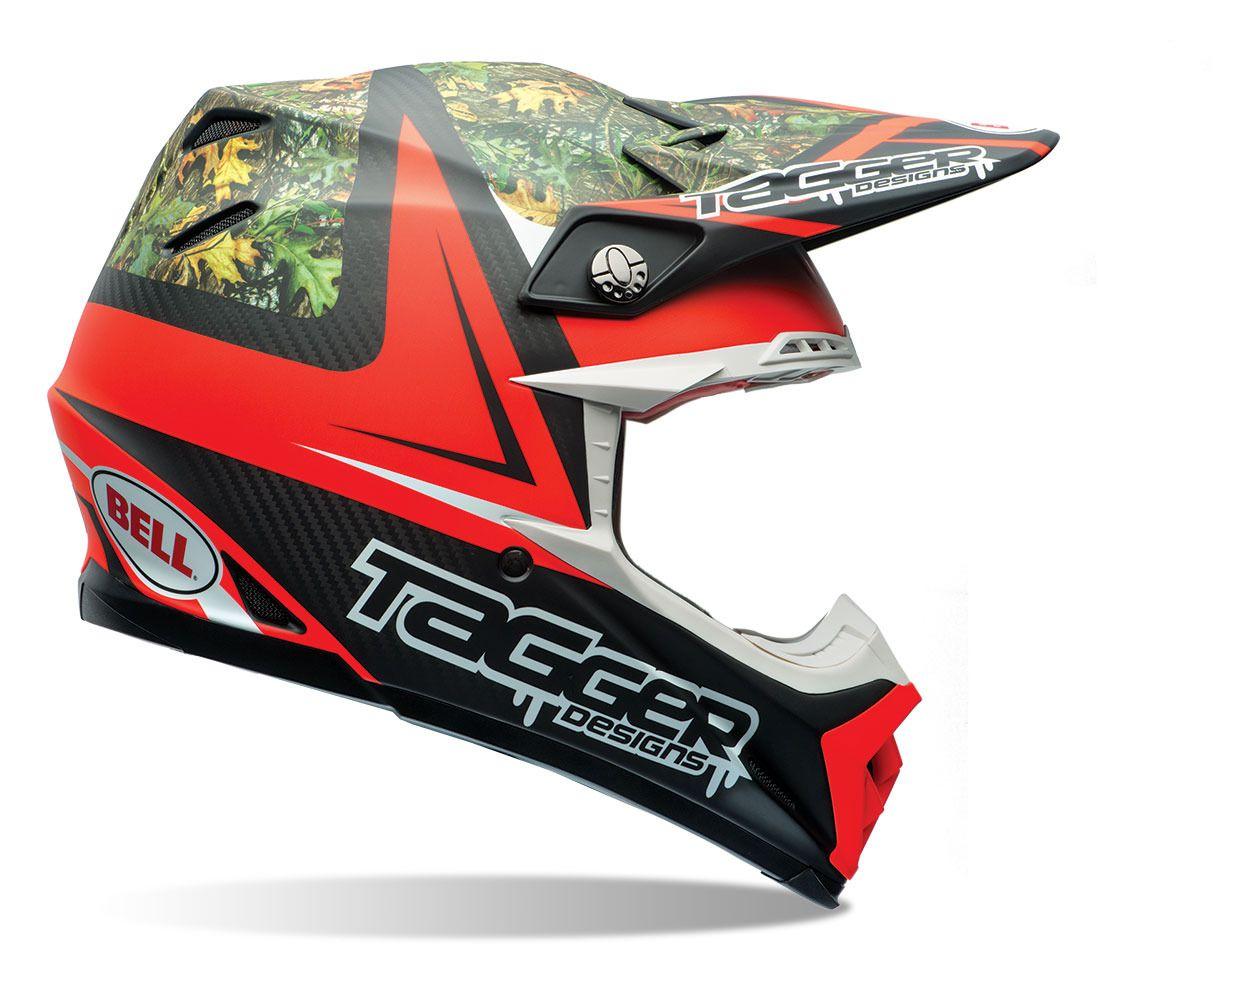 bell moto 9 flex tagger rekluse helmet revzilla. Black Bedroom Furniture Sets. Home Design Ideas